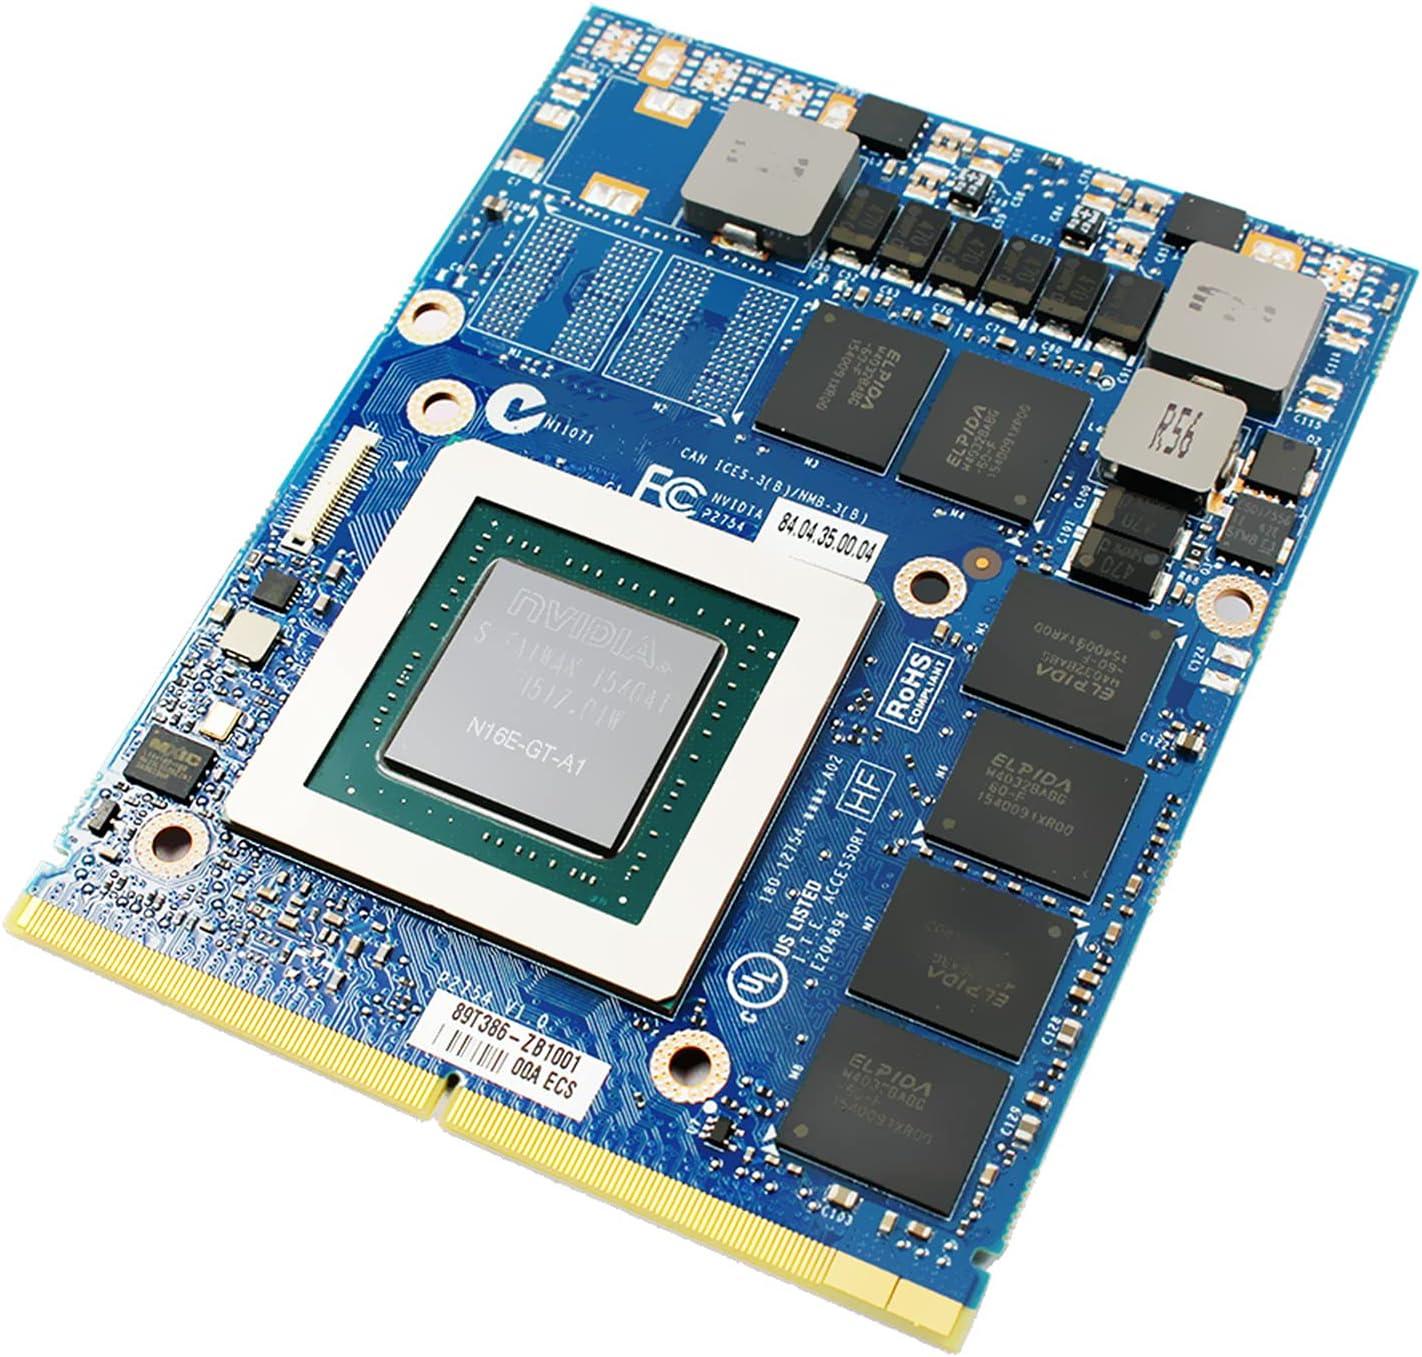 Tarjeta gráfica de 6 GB de reemplazo, para NVIDIA GeForce GTX 970M, para MSI Clevo Gaming Laptop P150EM P150SM P170EM P370EM P570WM P750 P770ZM P870DM, N16E-GT-A1 GDDR5 MXM VGA Board